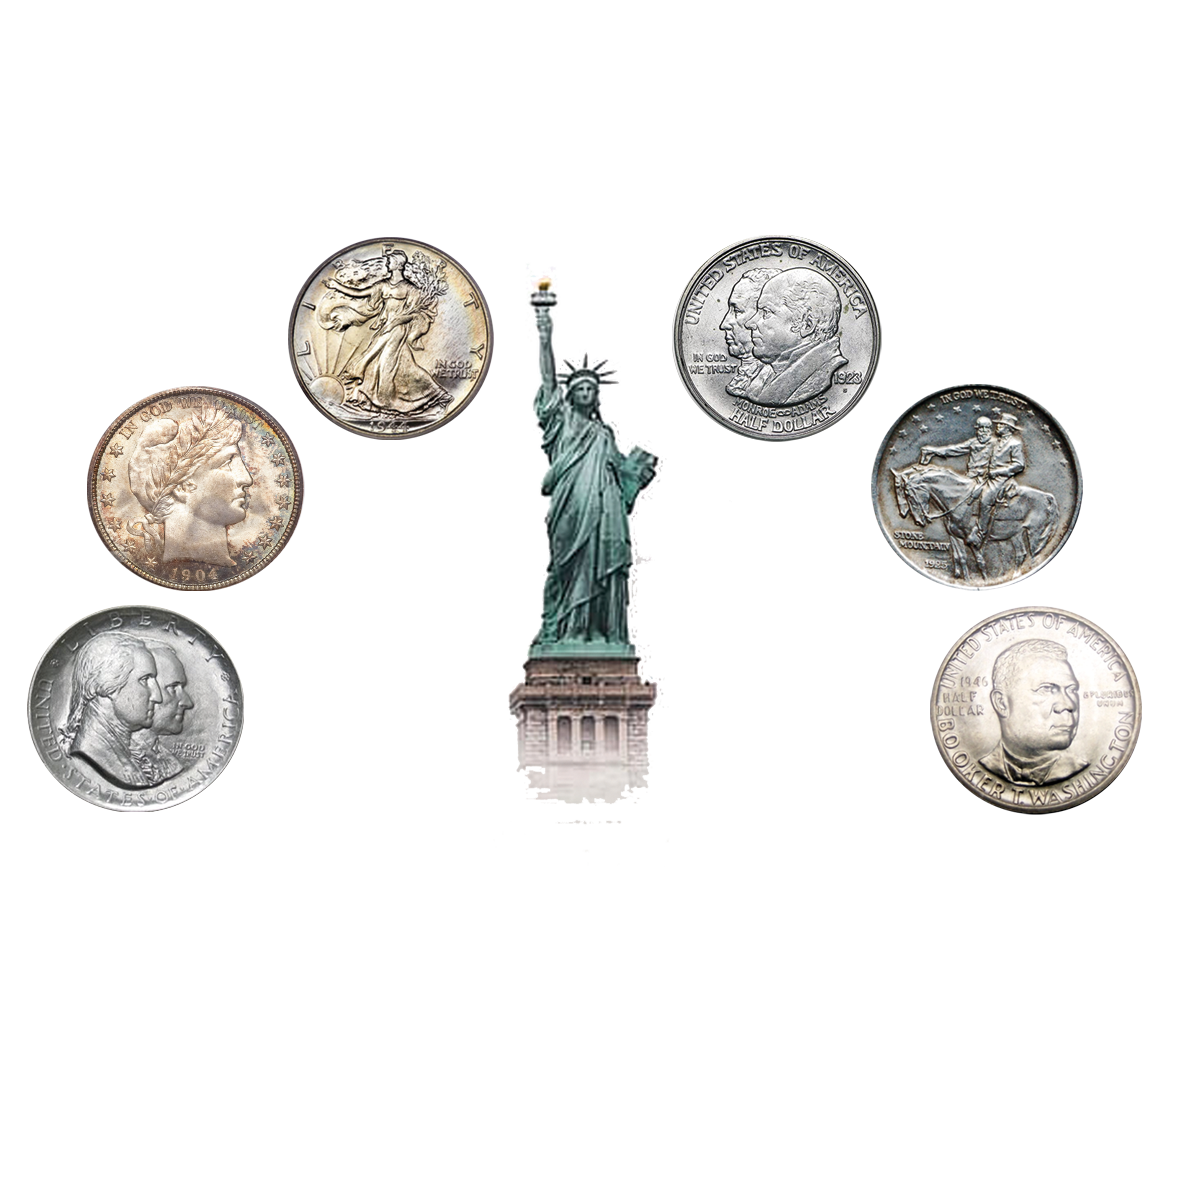 All-dollars